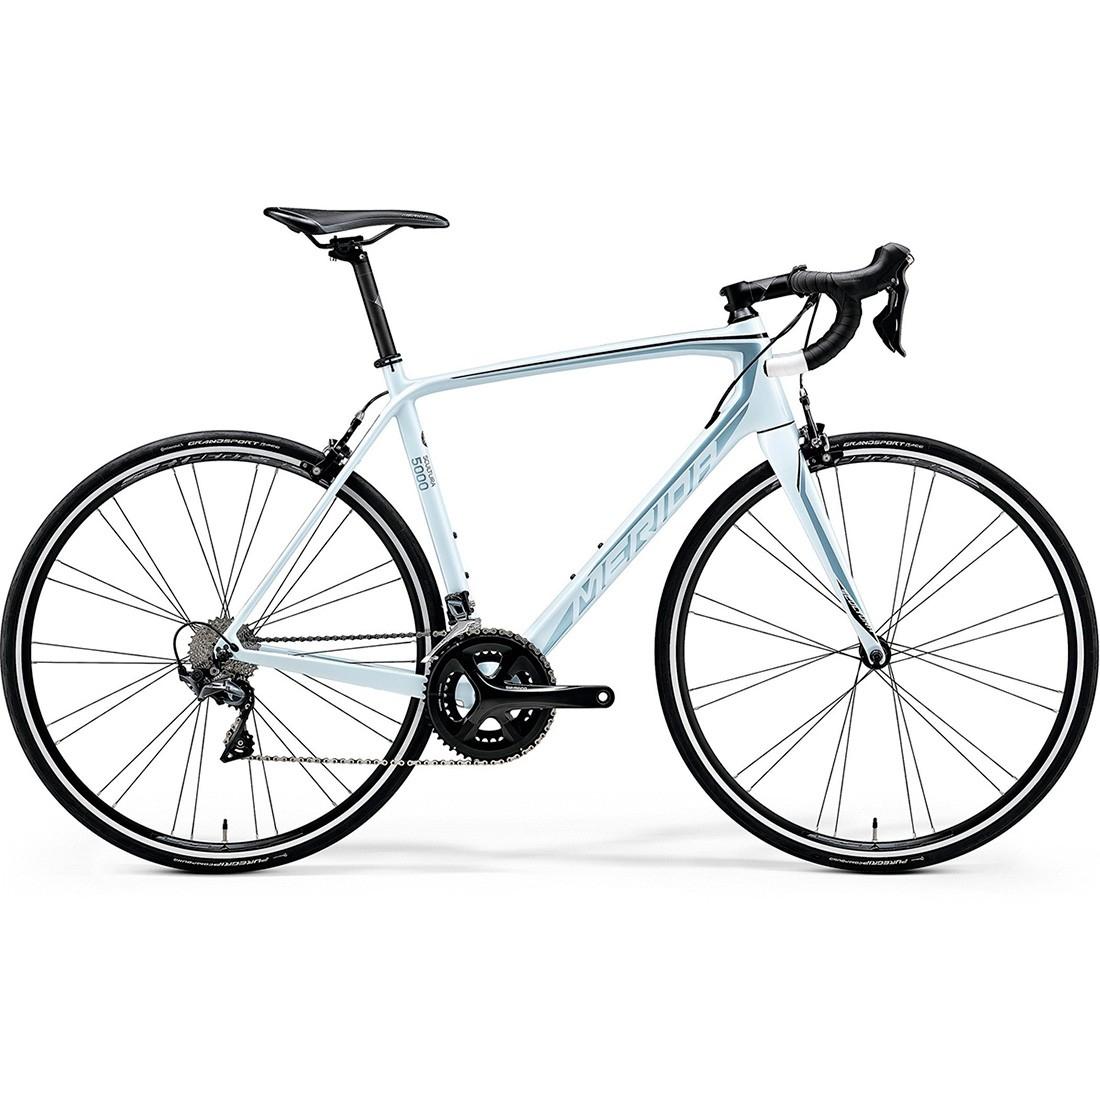 Rennrad Merida Scultura 5000 2018 White Blue Black